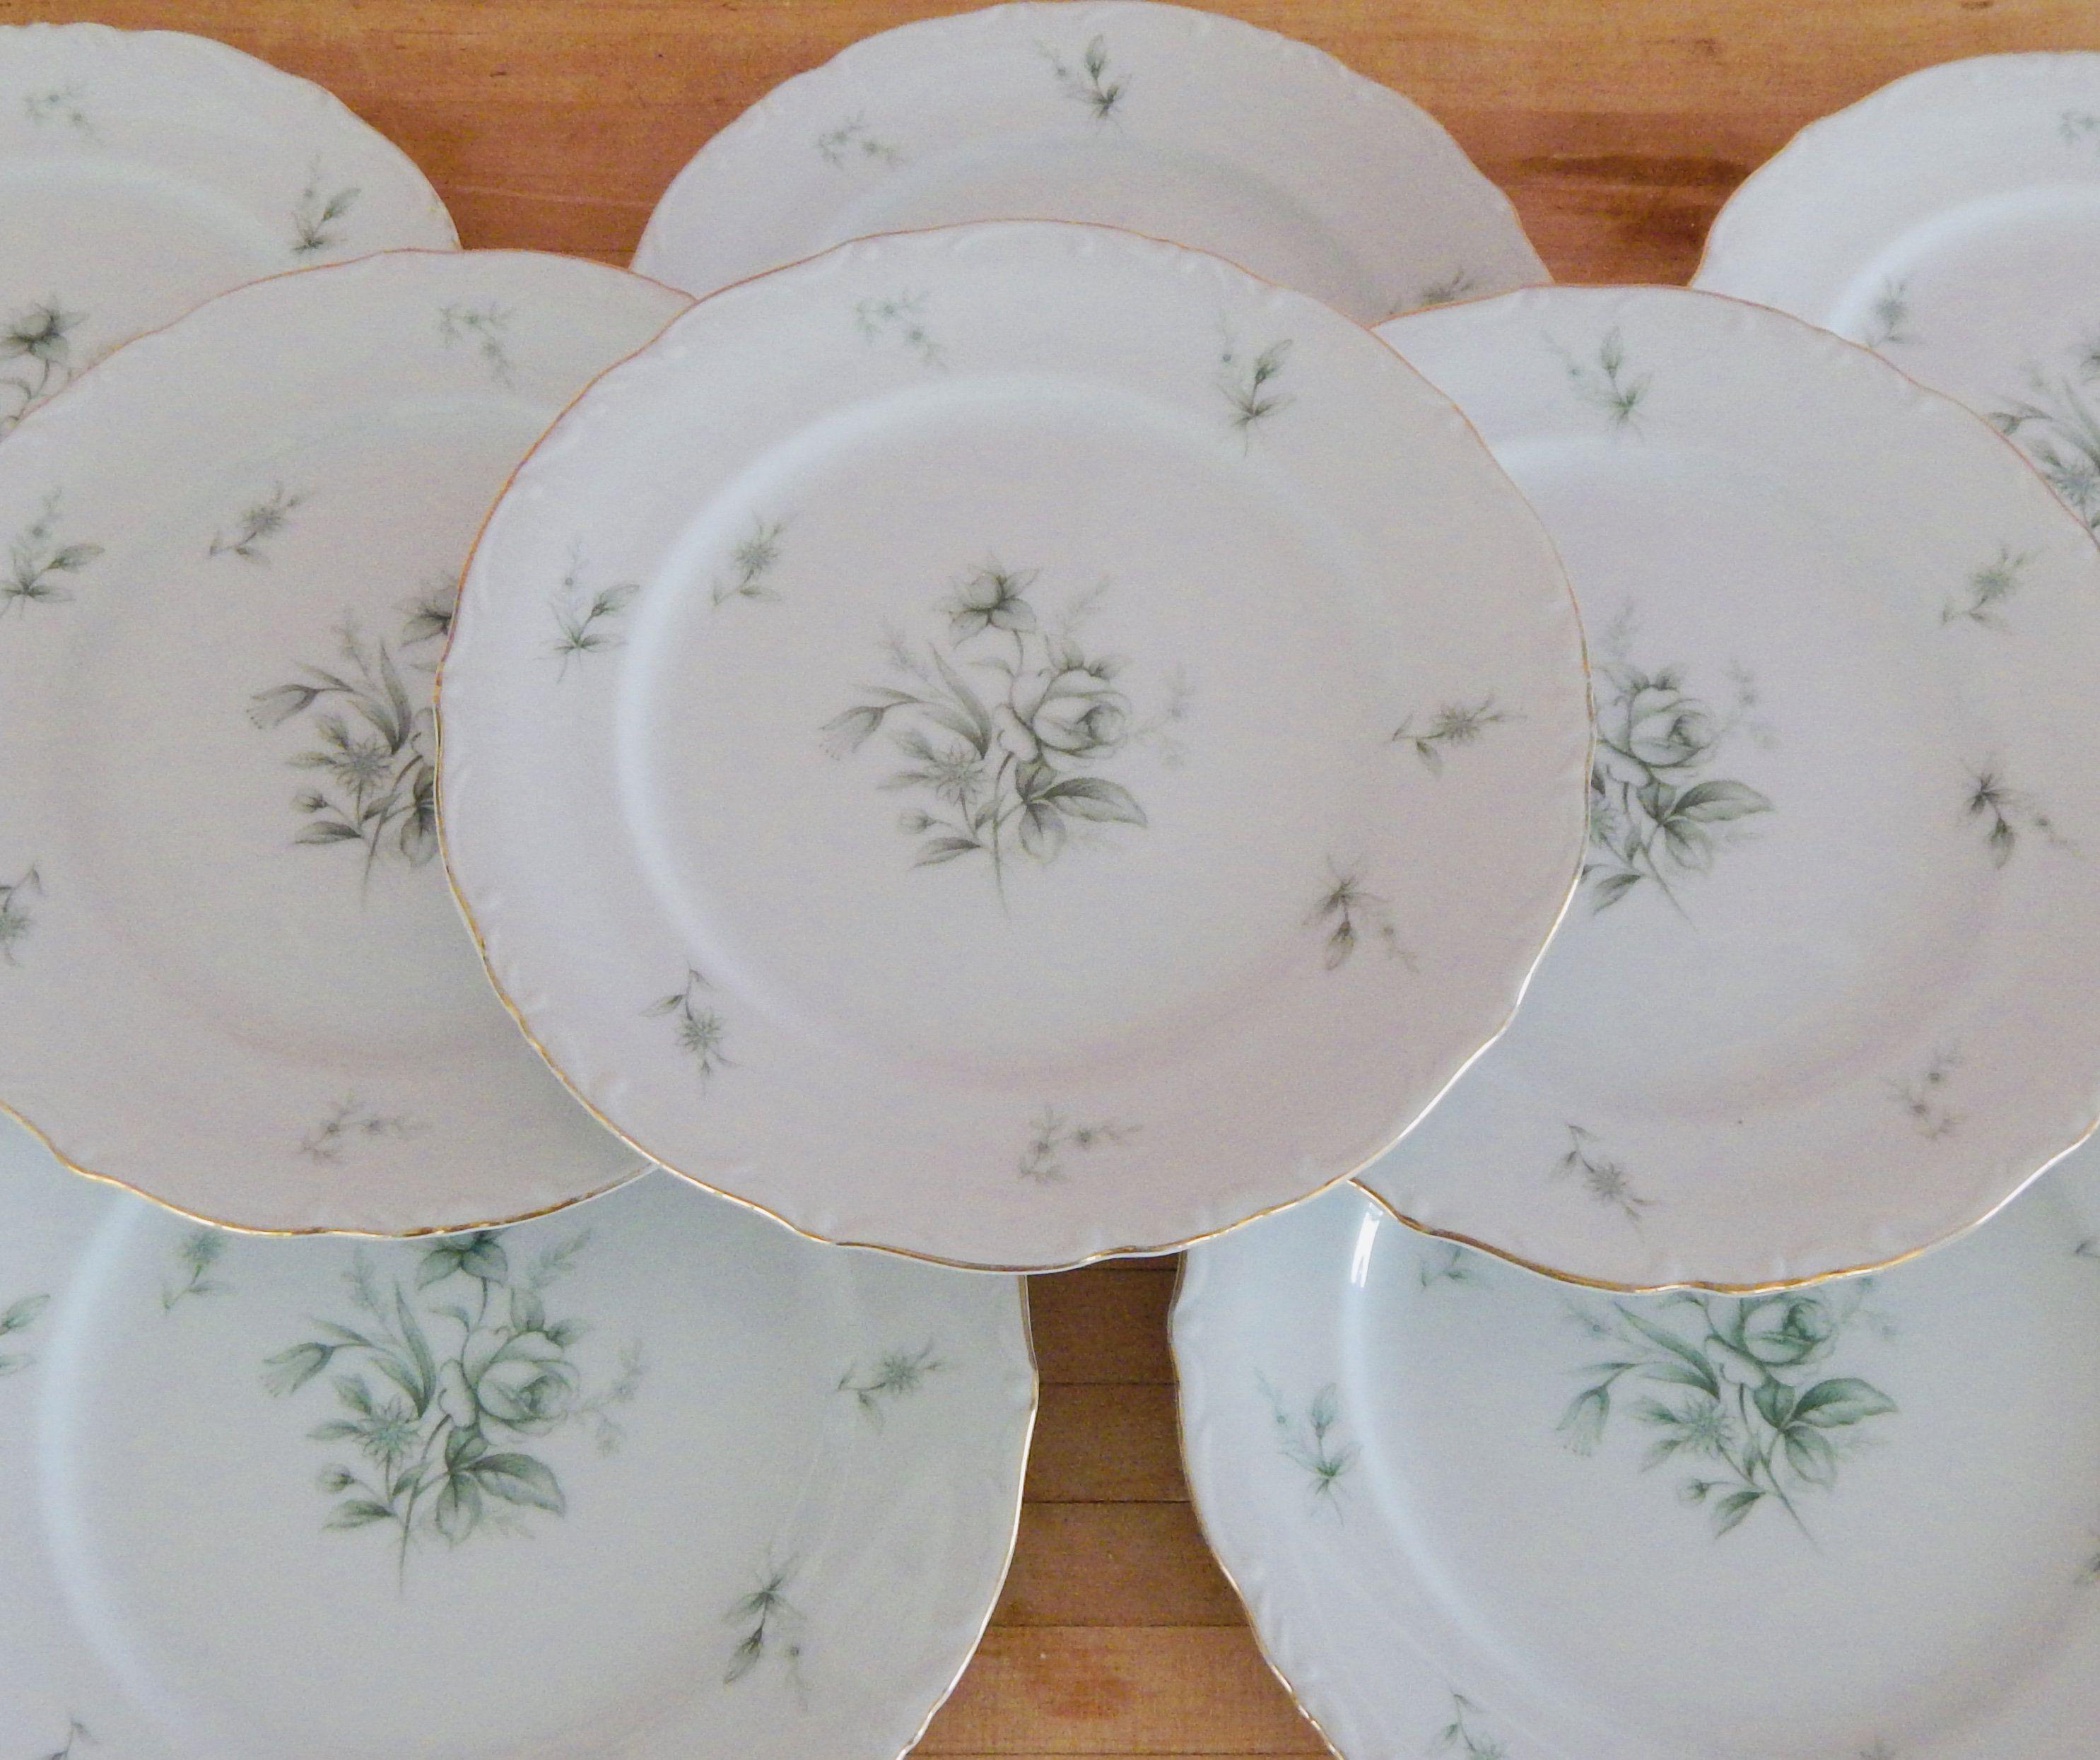 Vintage China Dinner Plates Yamato China Bulk Plates Jade Rose